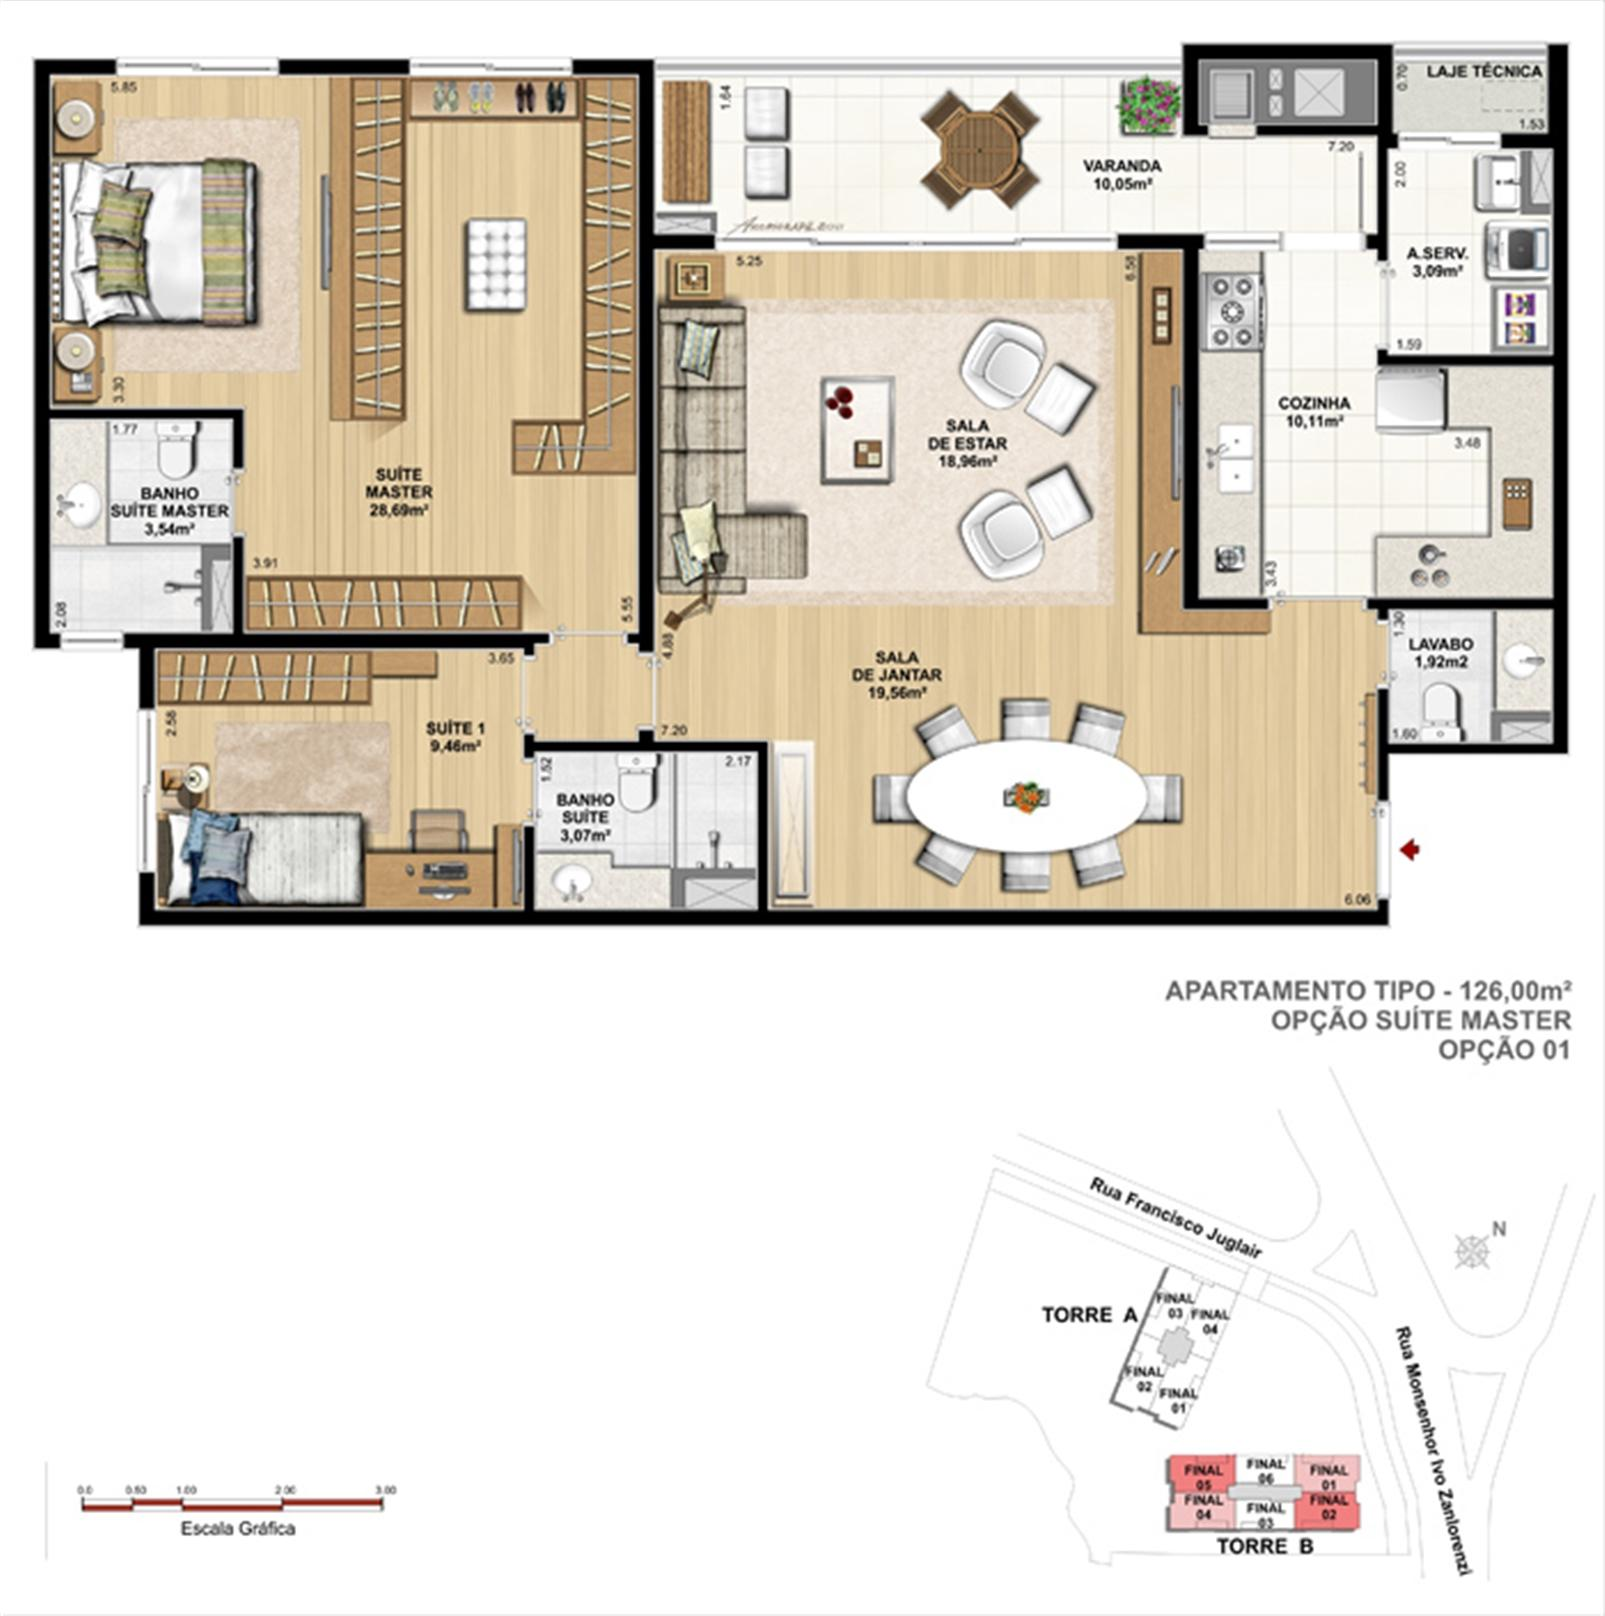 Torre 2 - 2 suítes | Reserva Juglair Ecoville – Apartamentono  Ecoville - Curitiba - Paraná